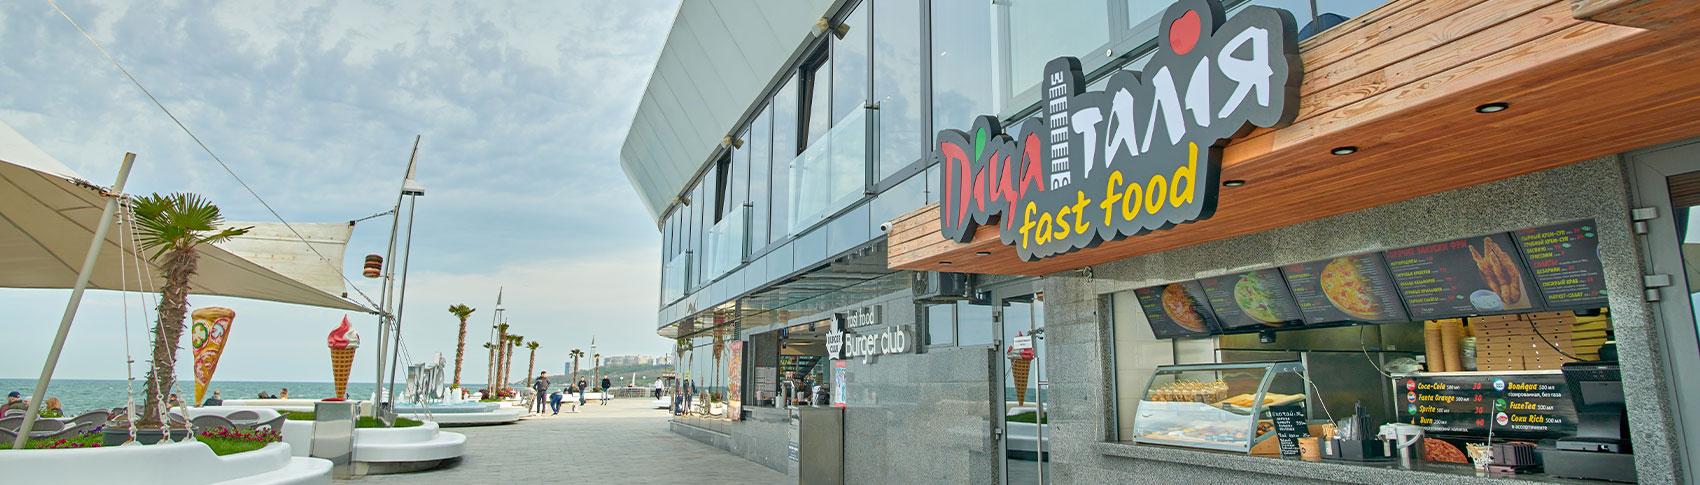 Food Court im RESORT & SPA HOTEL NEMO, foto № 1